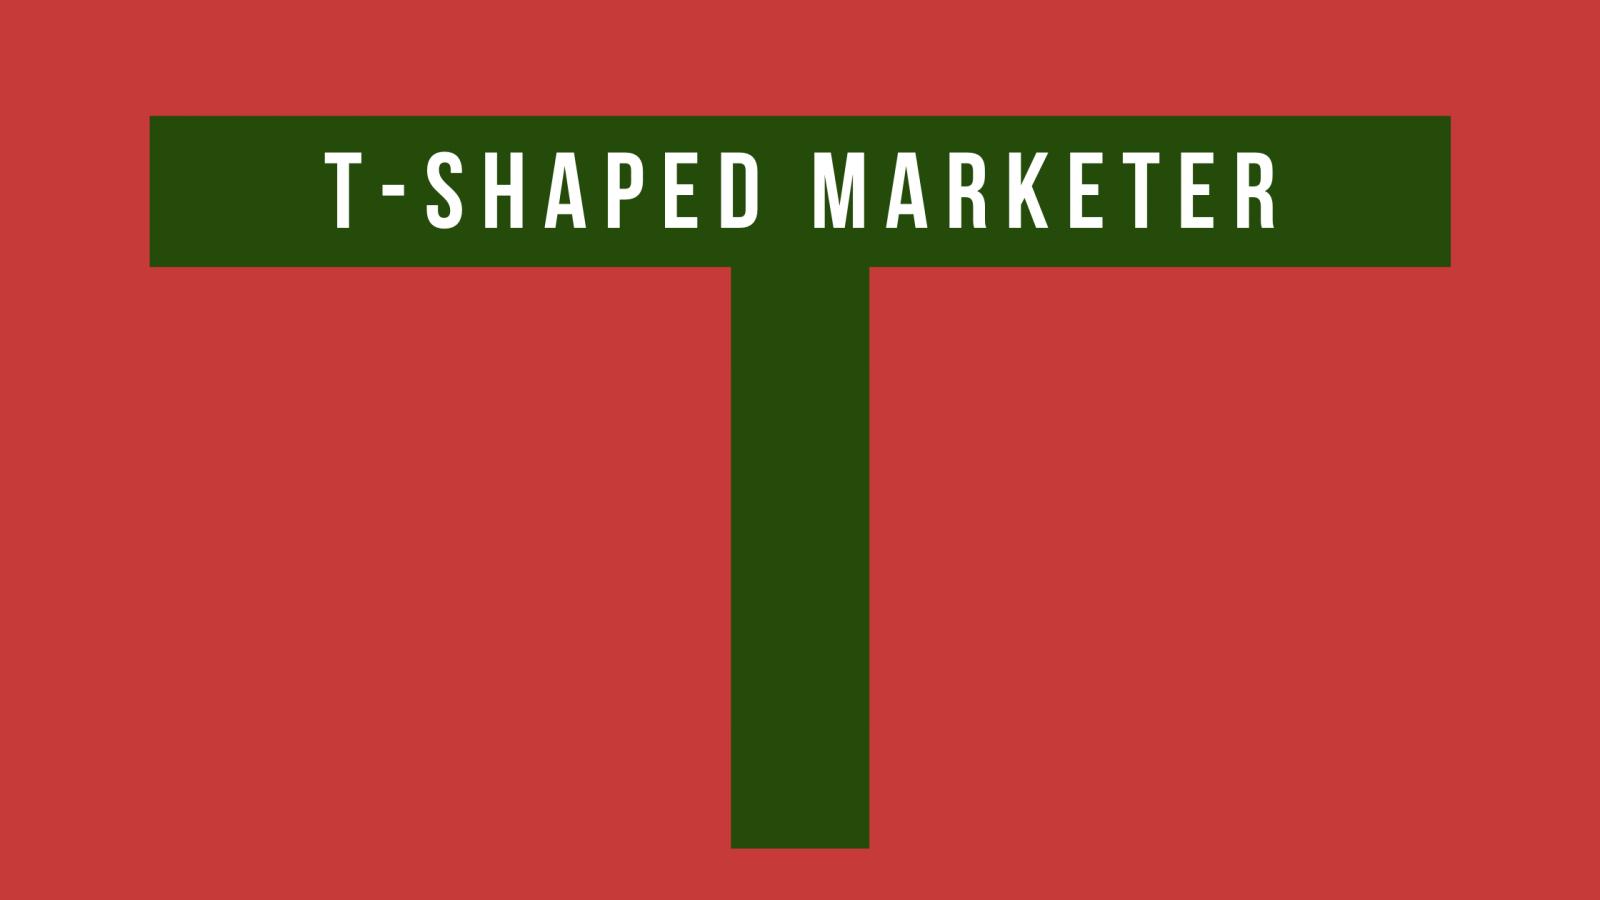 Kim jest T-shaped Marketer?